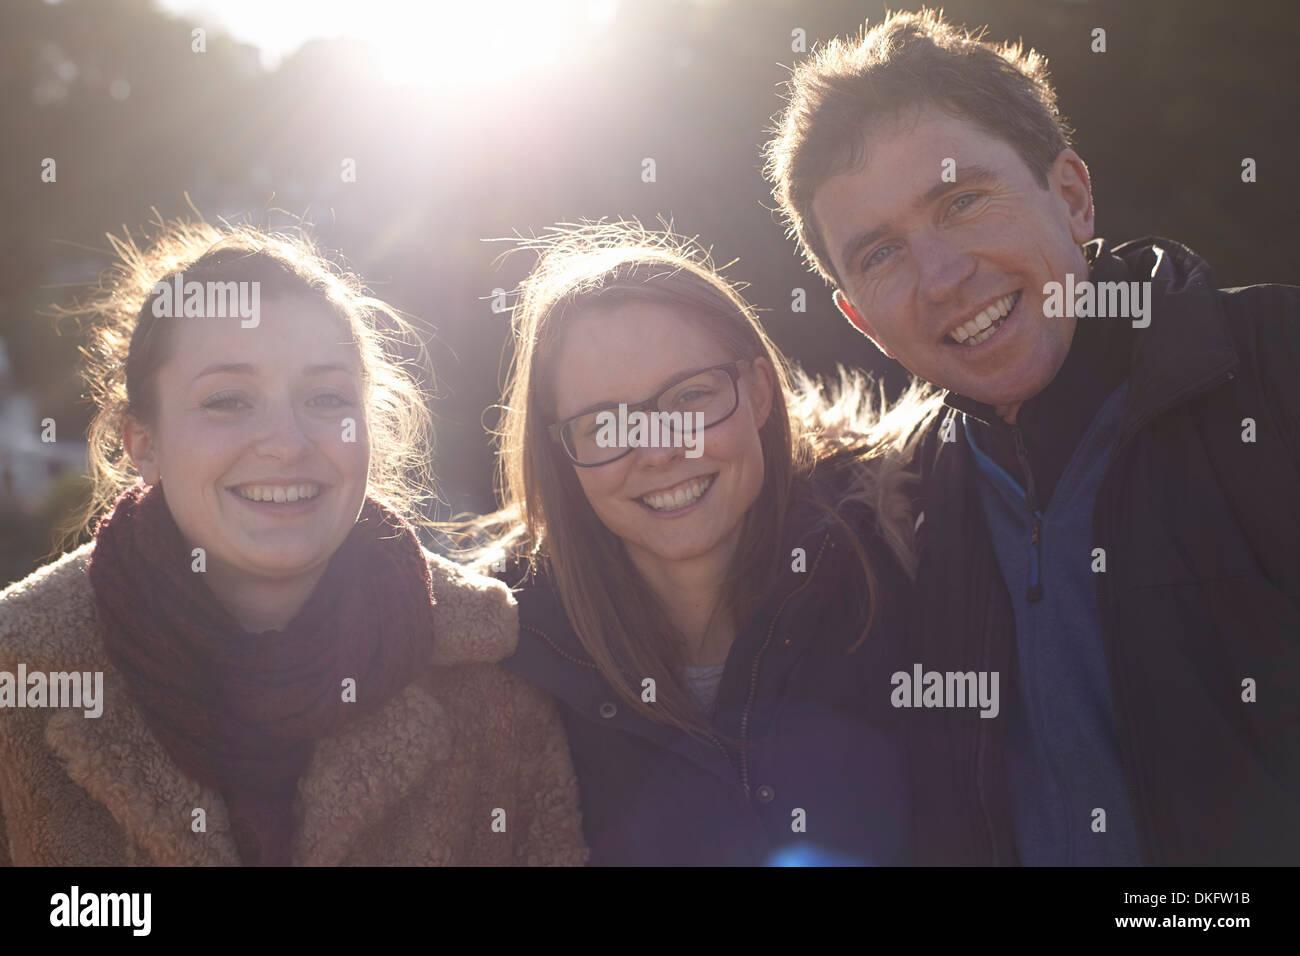 Friends on day trip in Devon, UK wearing winter clothing - Stock Image